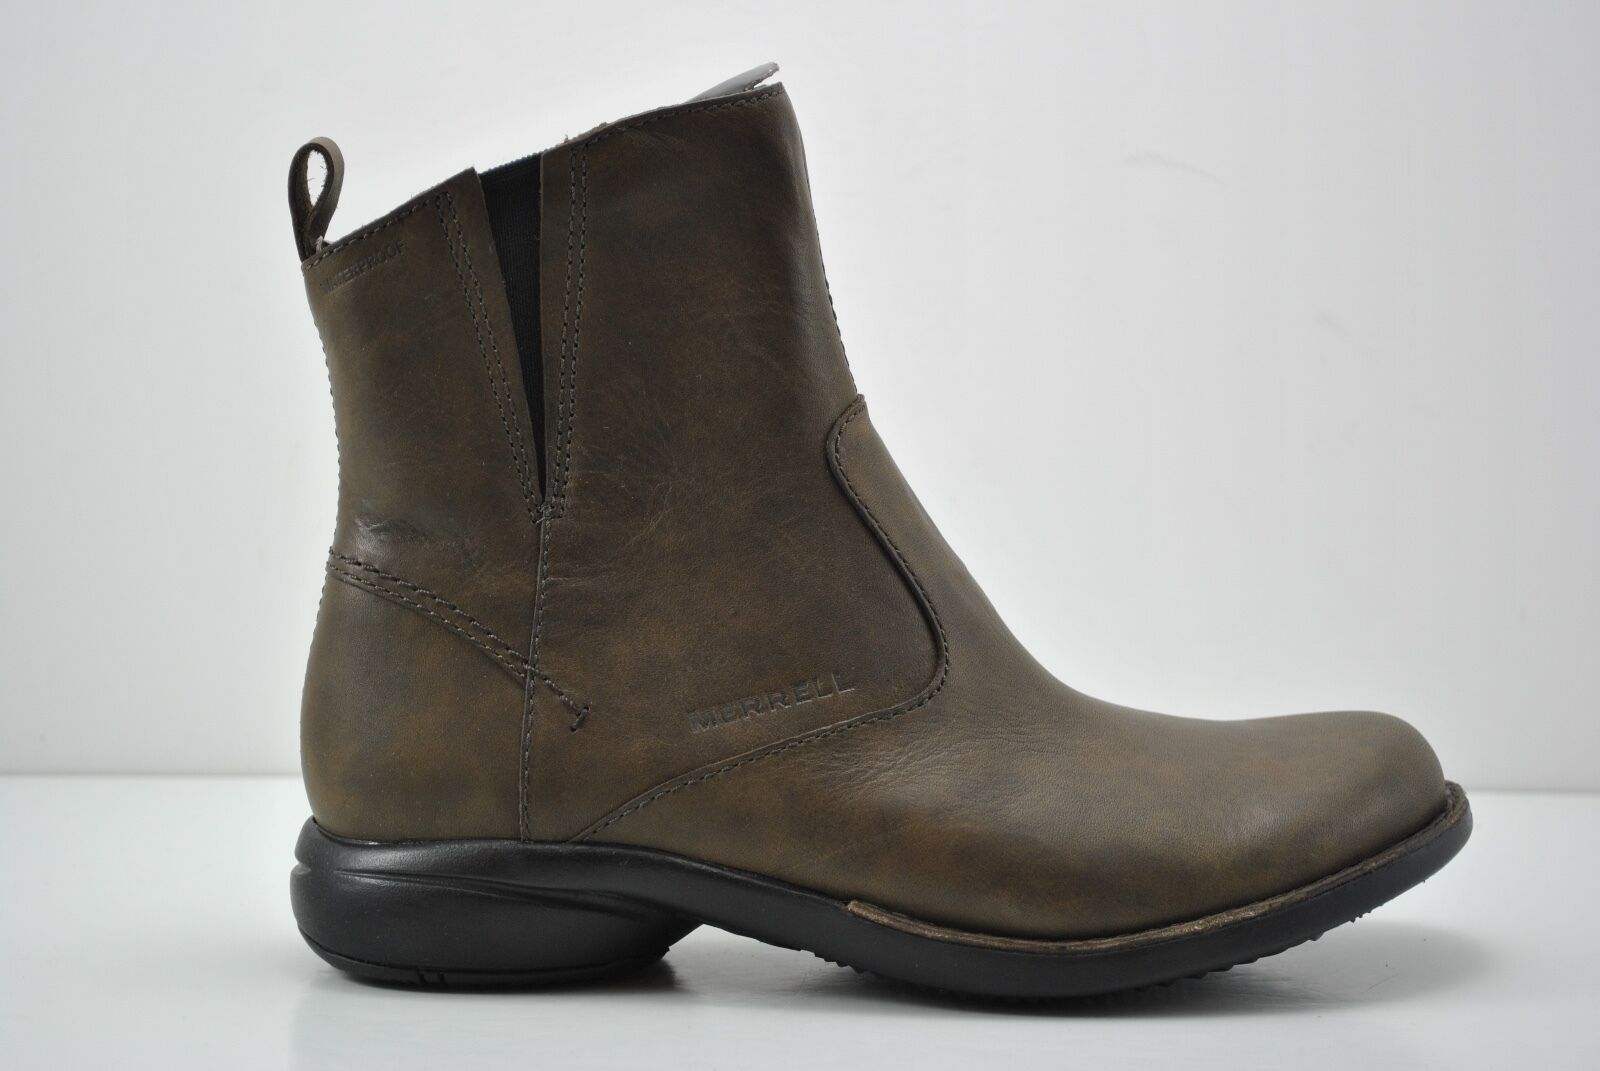 damen Merrell Tetra Catch Waterproof Leather Ankle Stiefel Größe 7M braun J45008